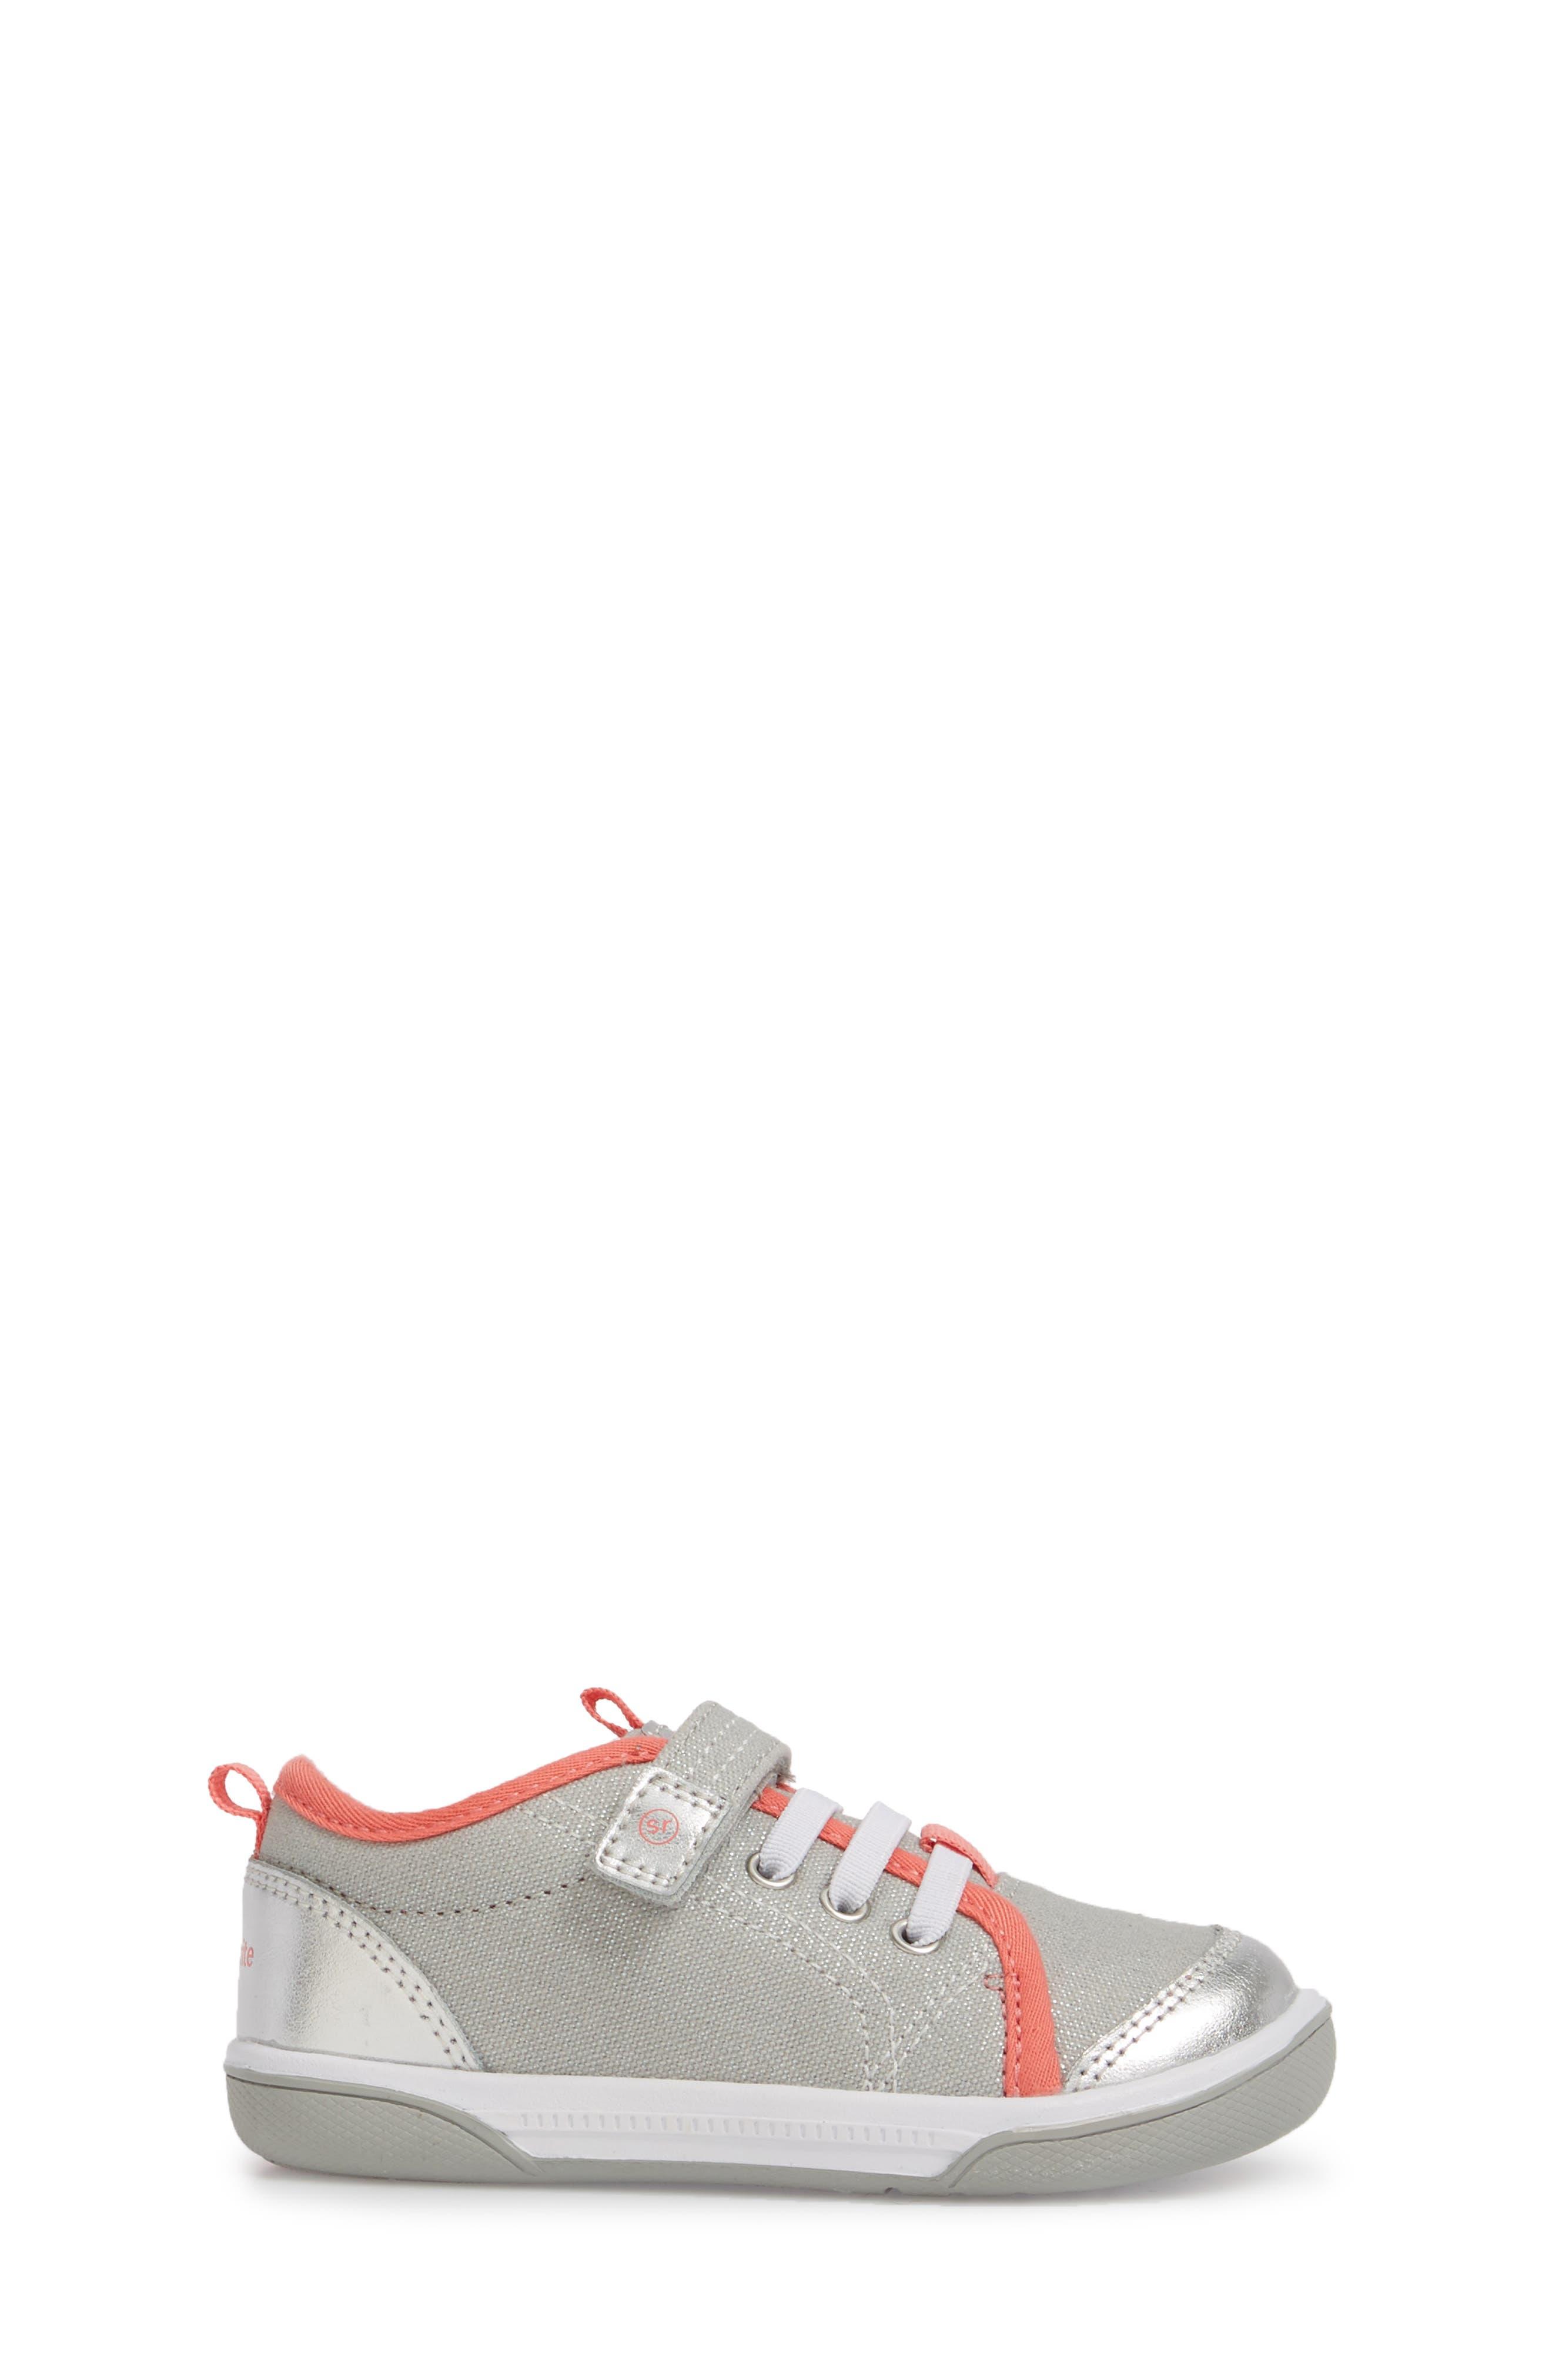 Dakota Sneaker,                             Alternate thumbnail 3, color,                             LIGHT GREY CANVAS